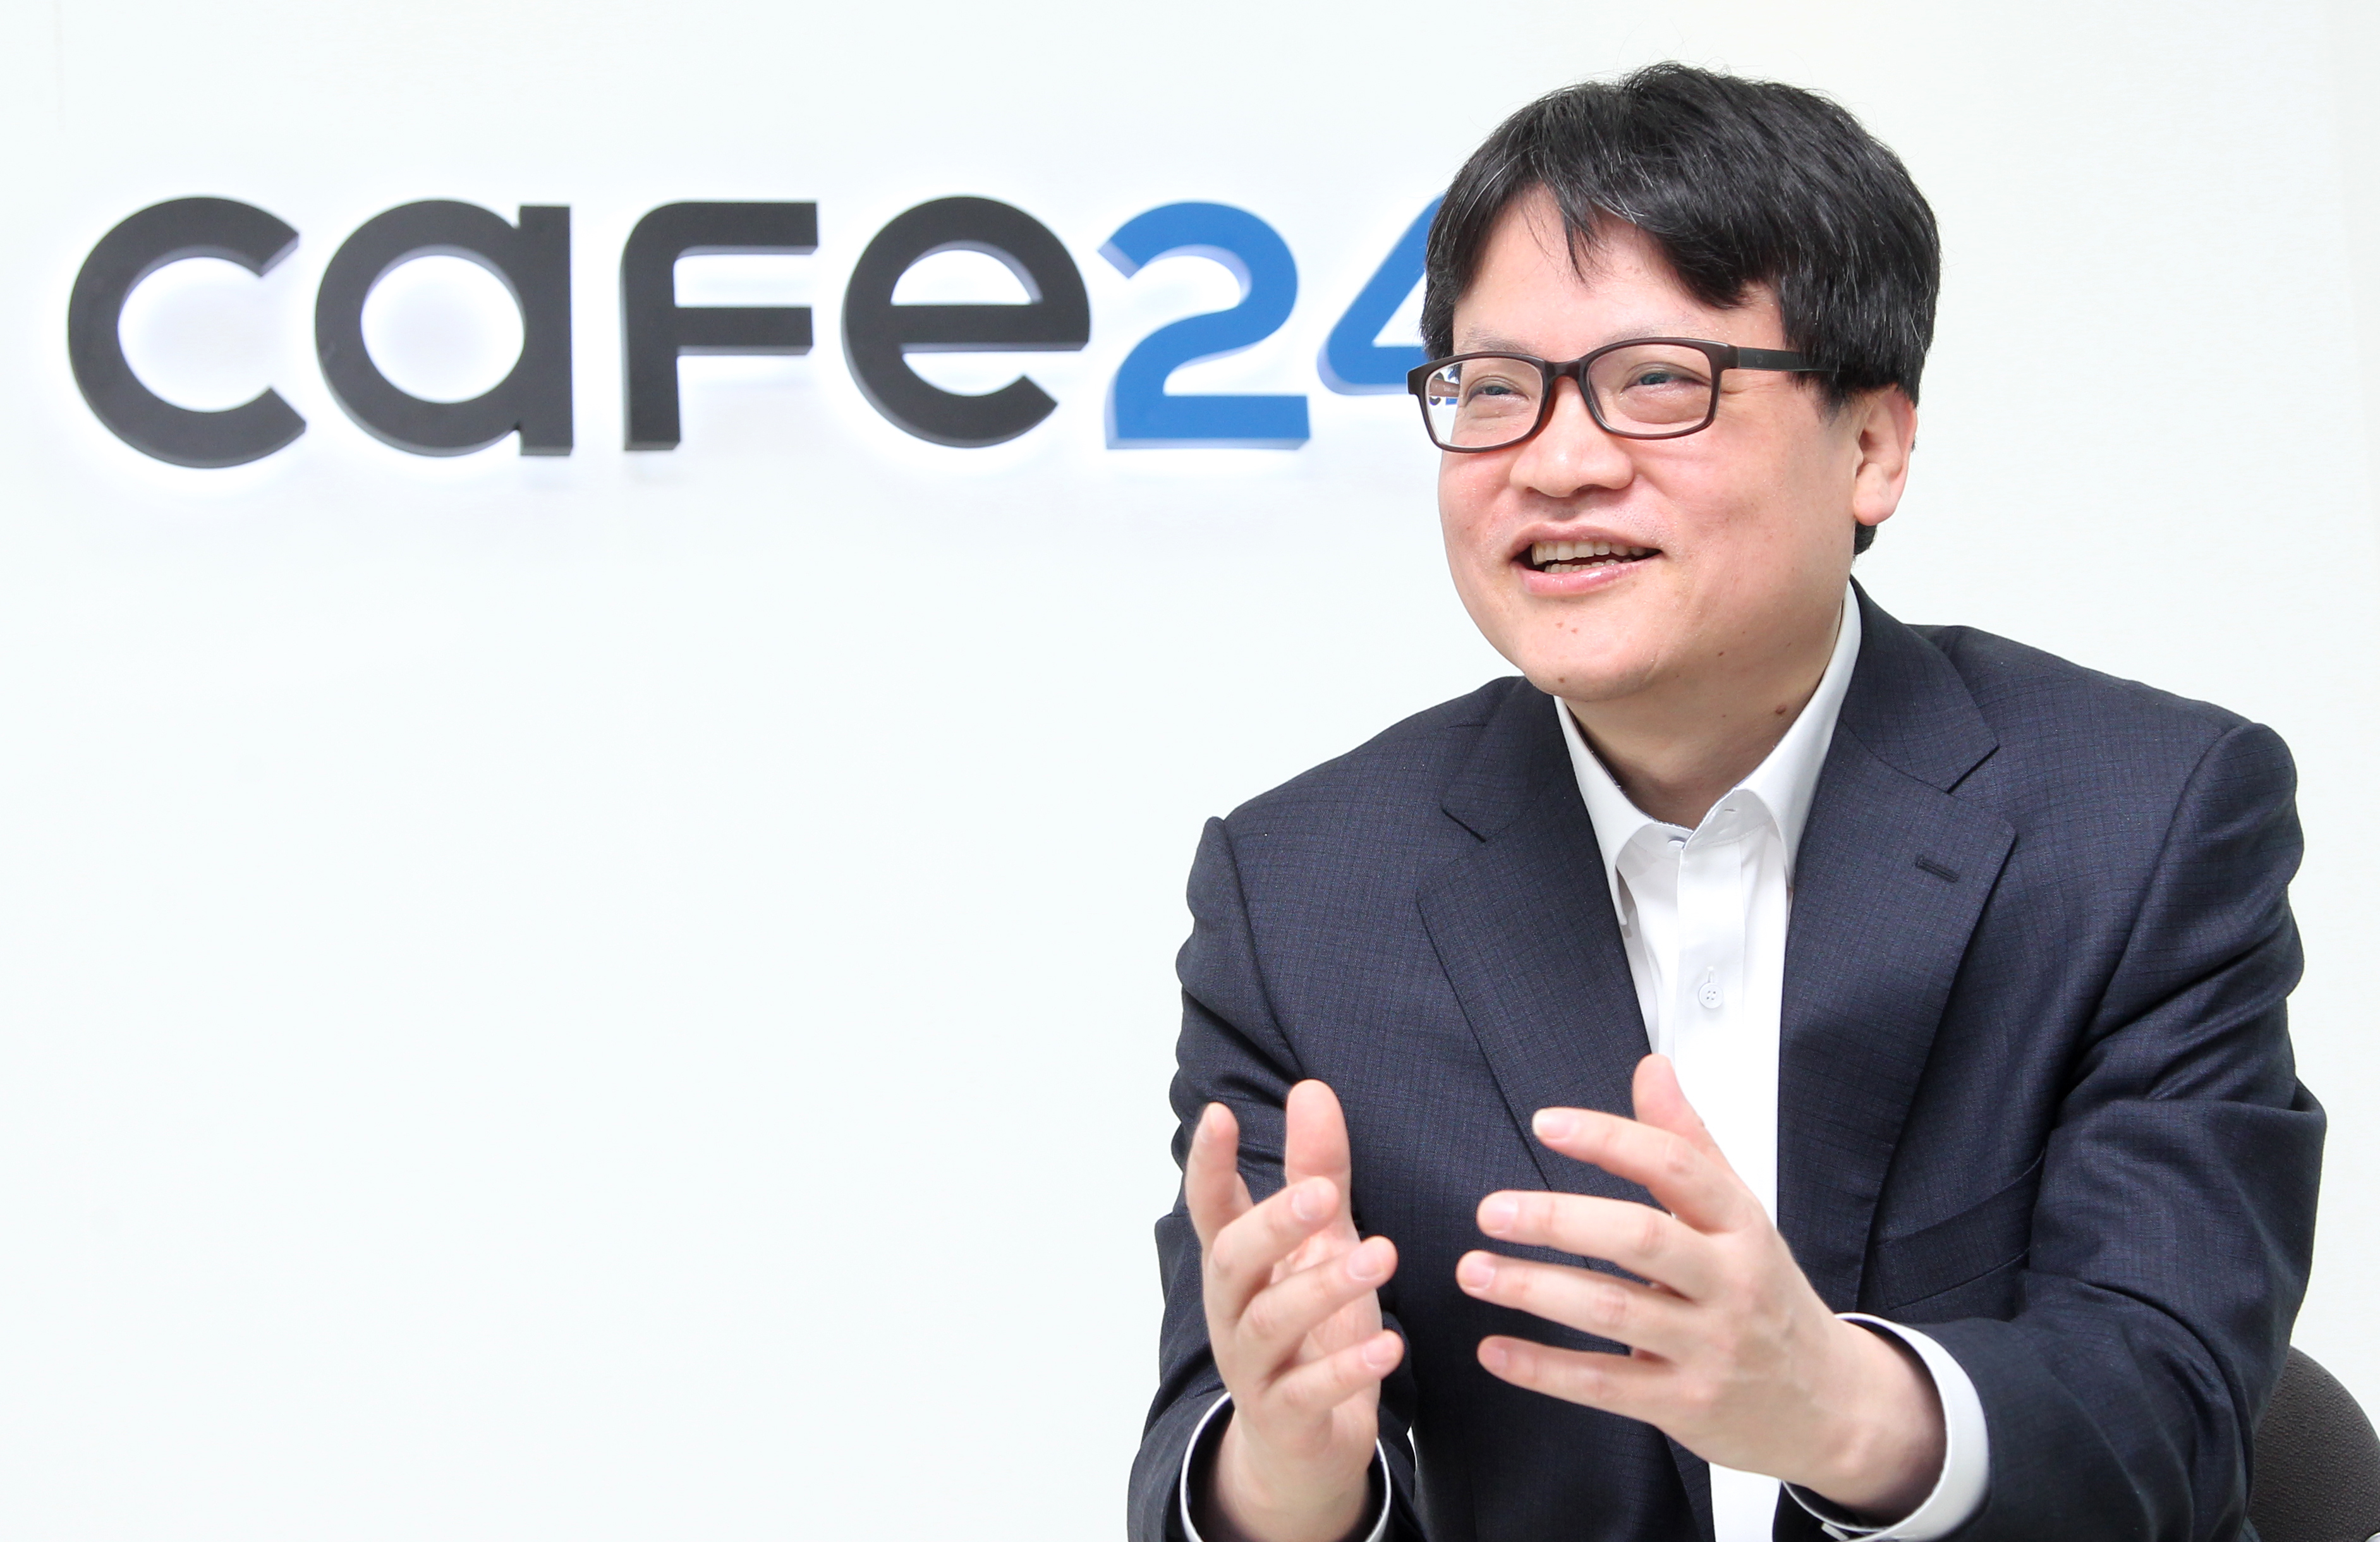 Cafe 24 chief executive officer Jaesuk Lee.